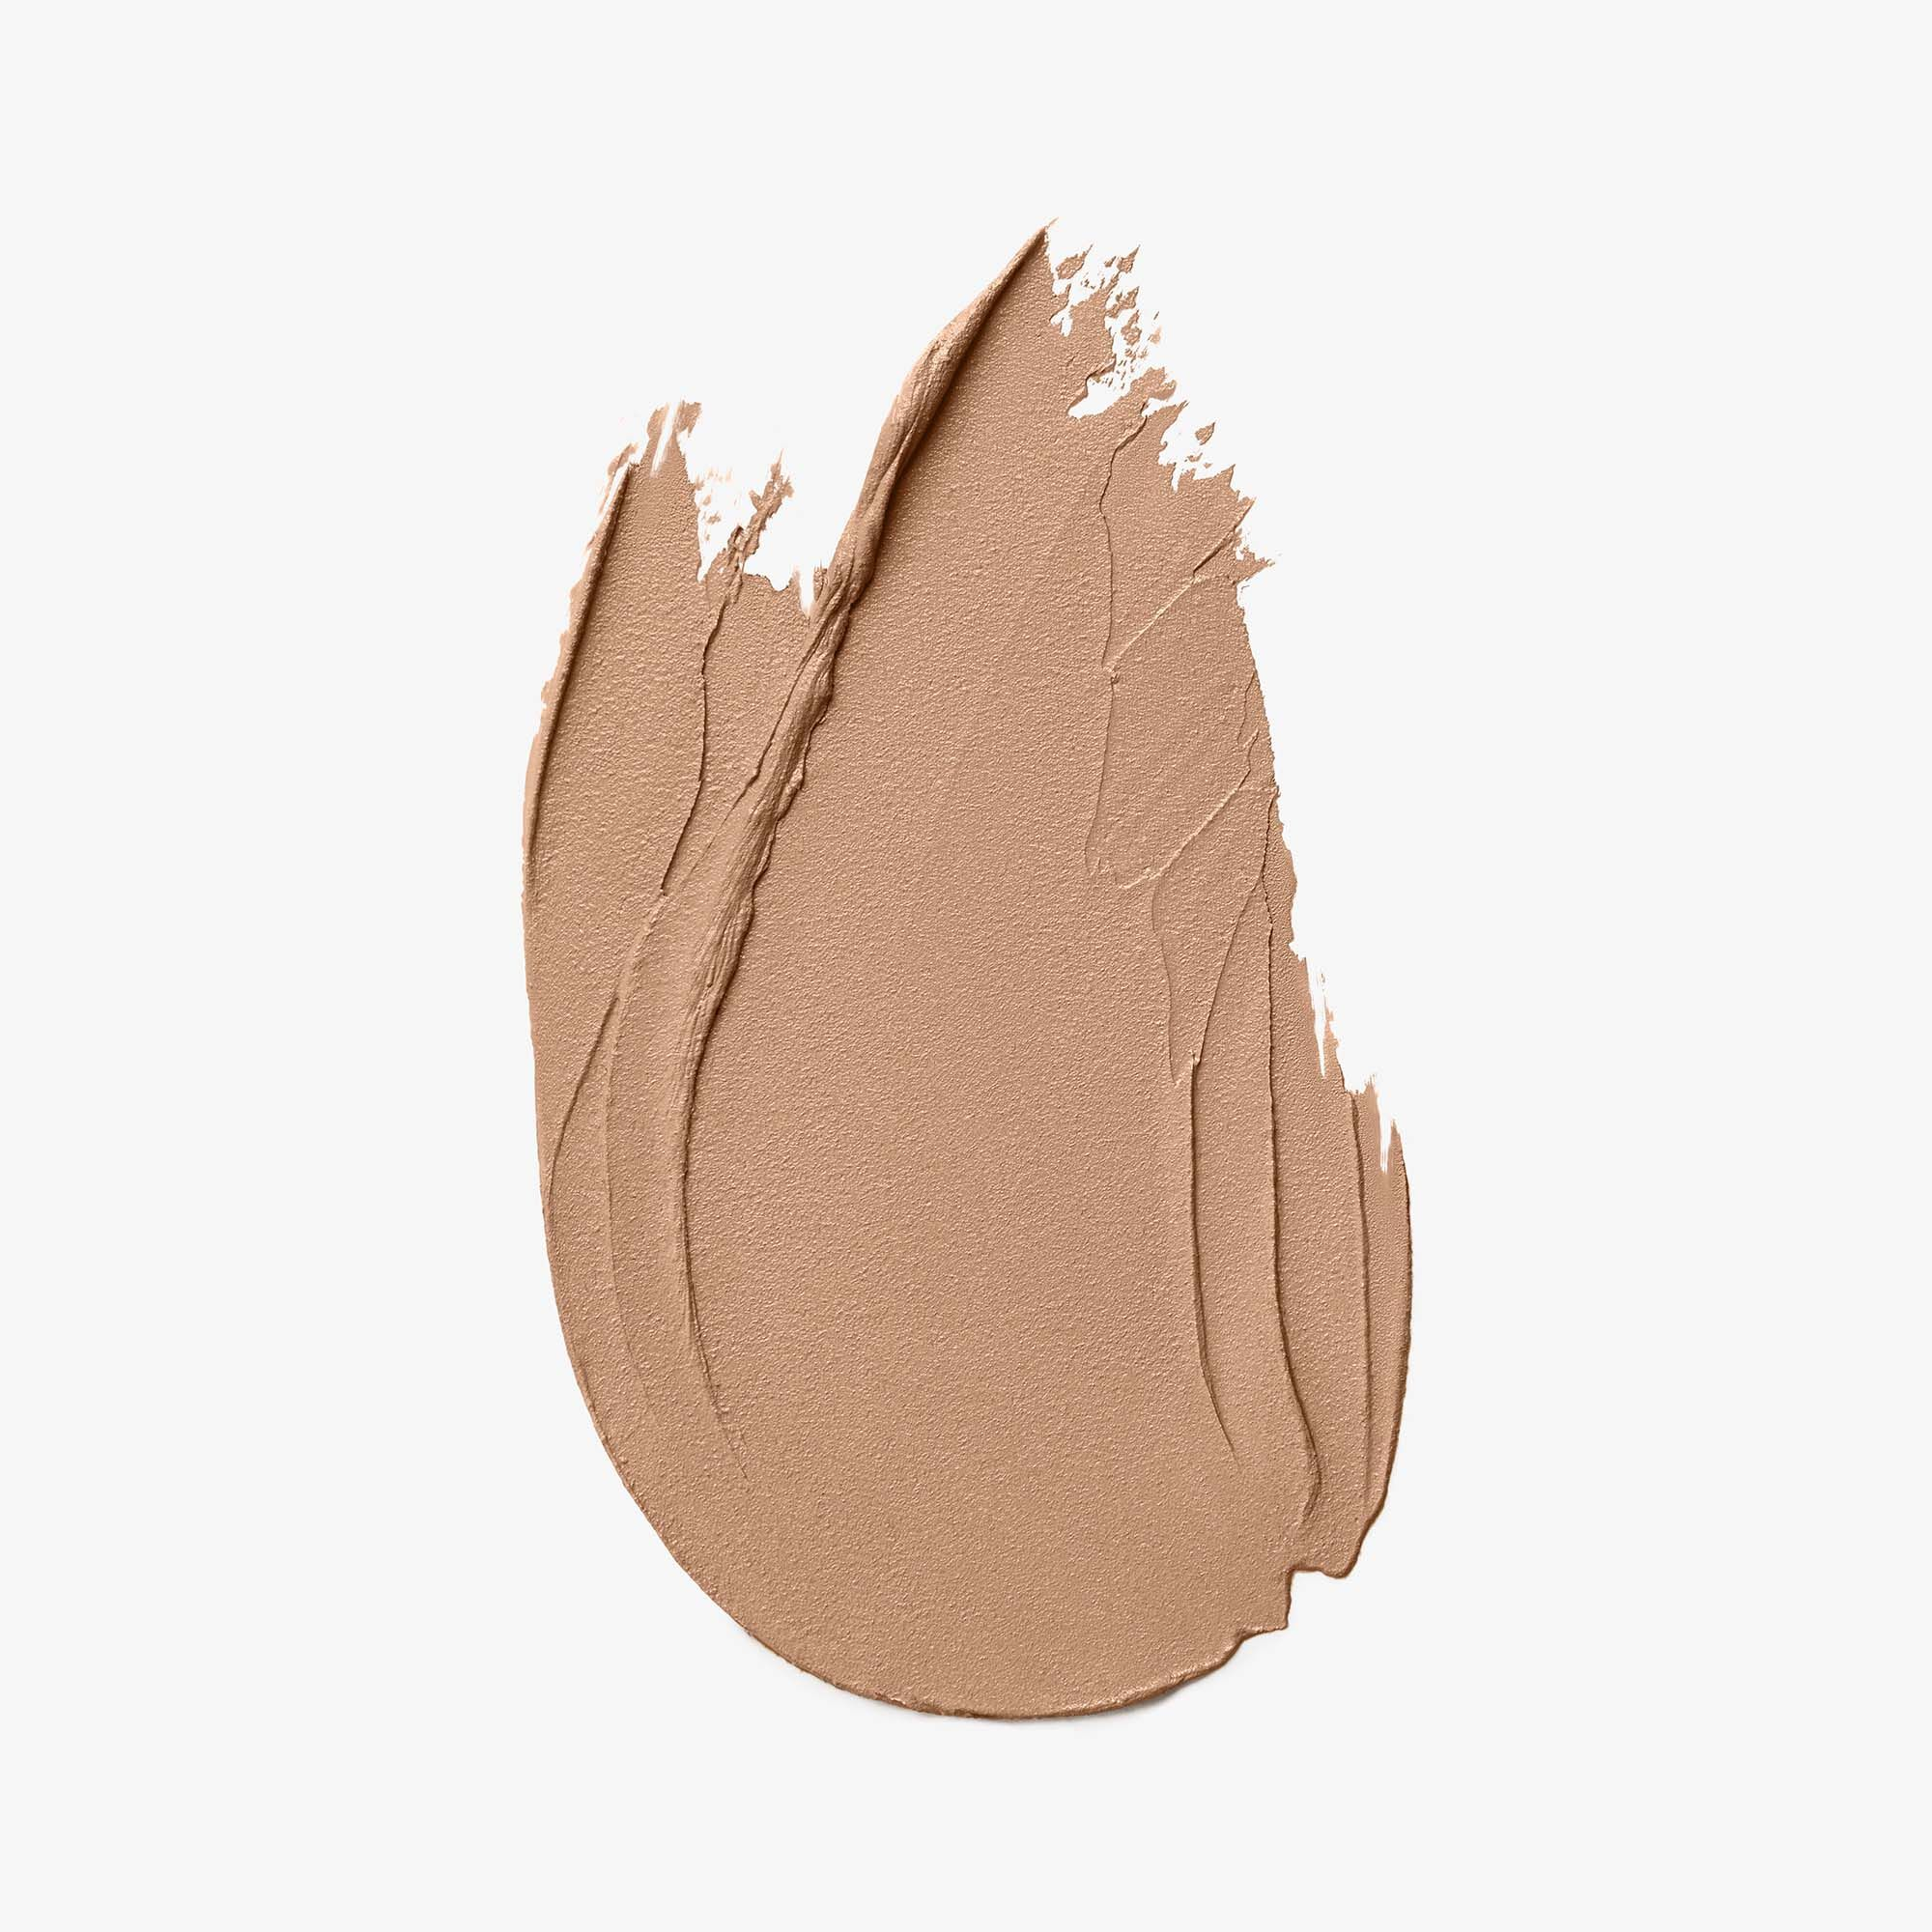 Everything Cream Foundation Compact